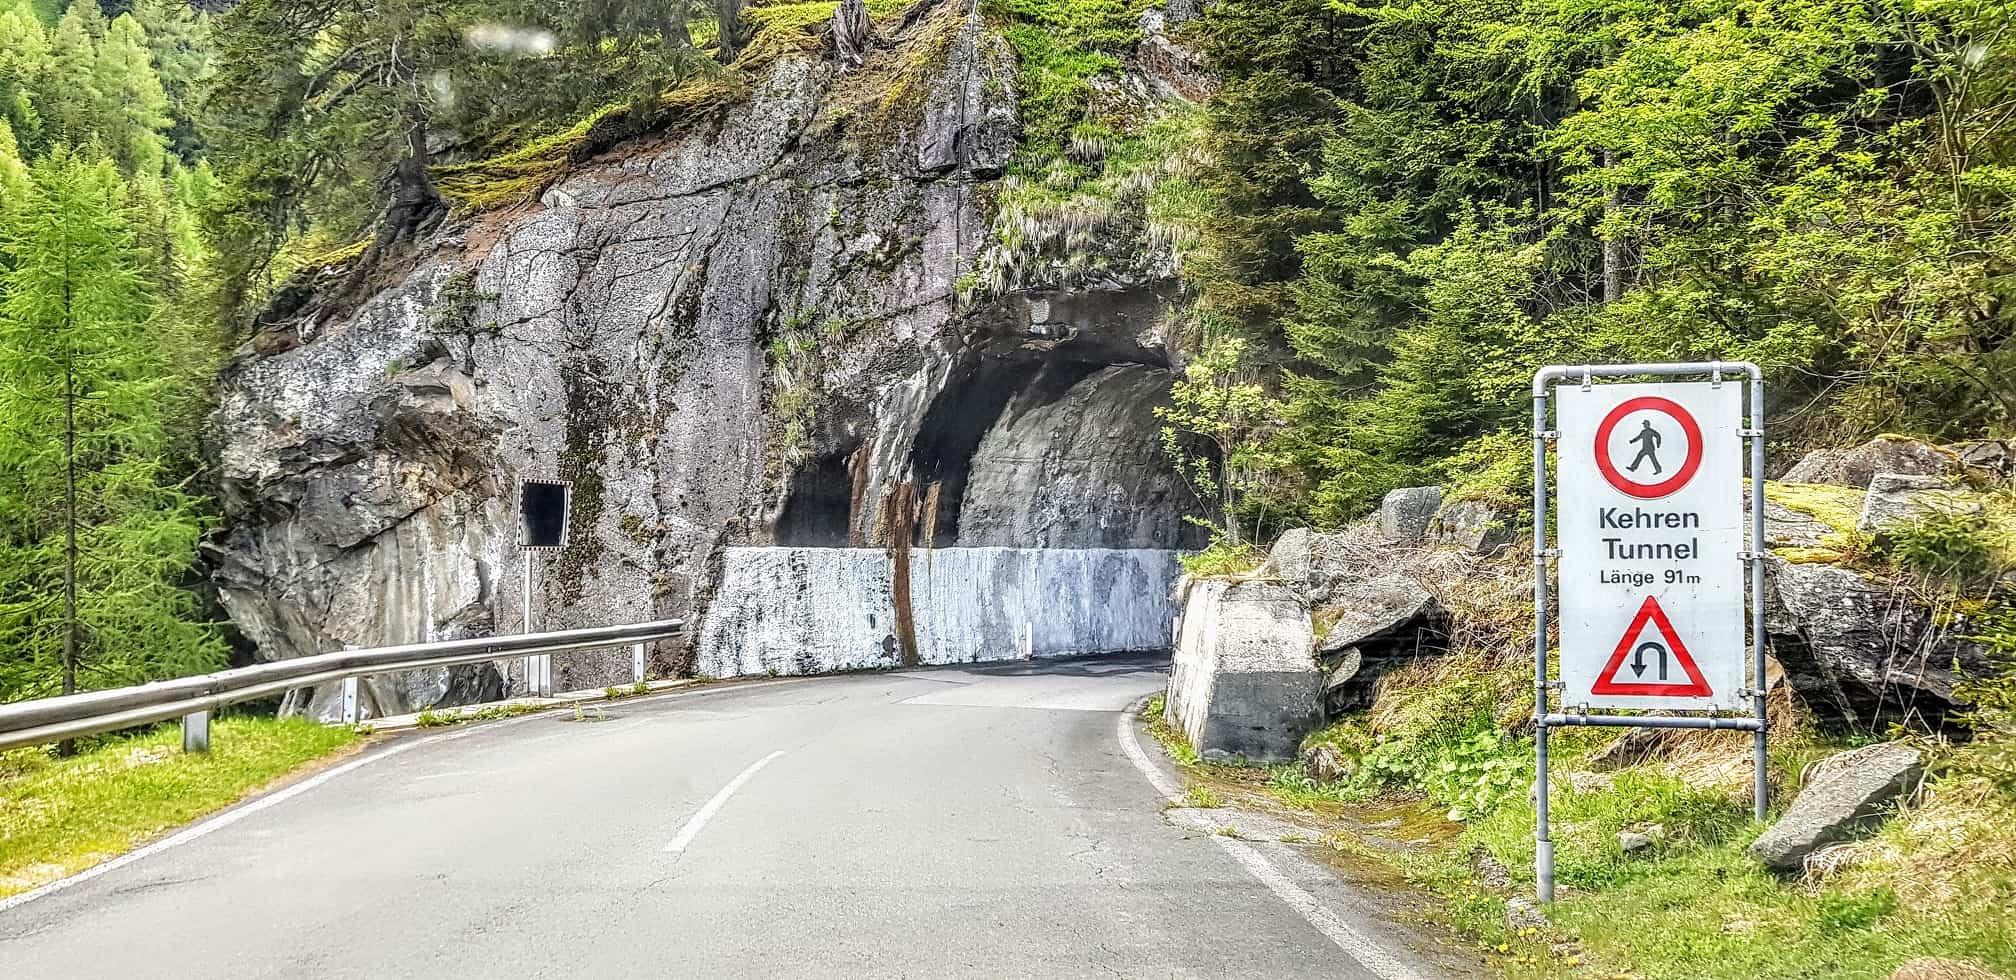 Tunnel auf Malta Hochalmstraße - Mautstraße in Kärnten